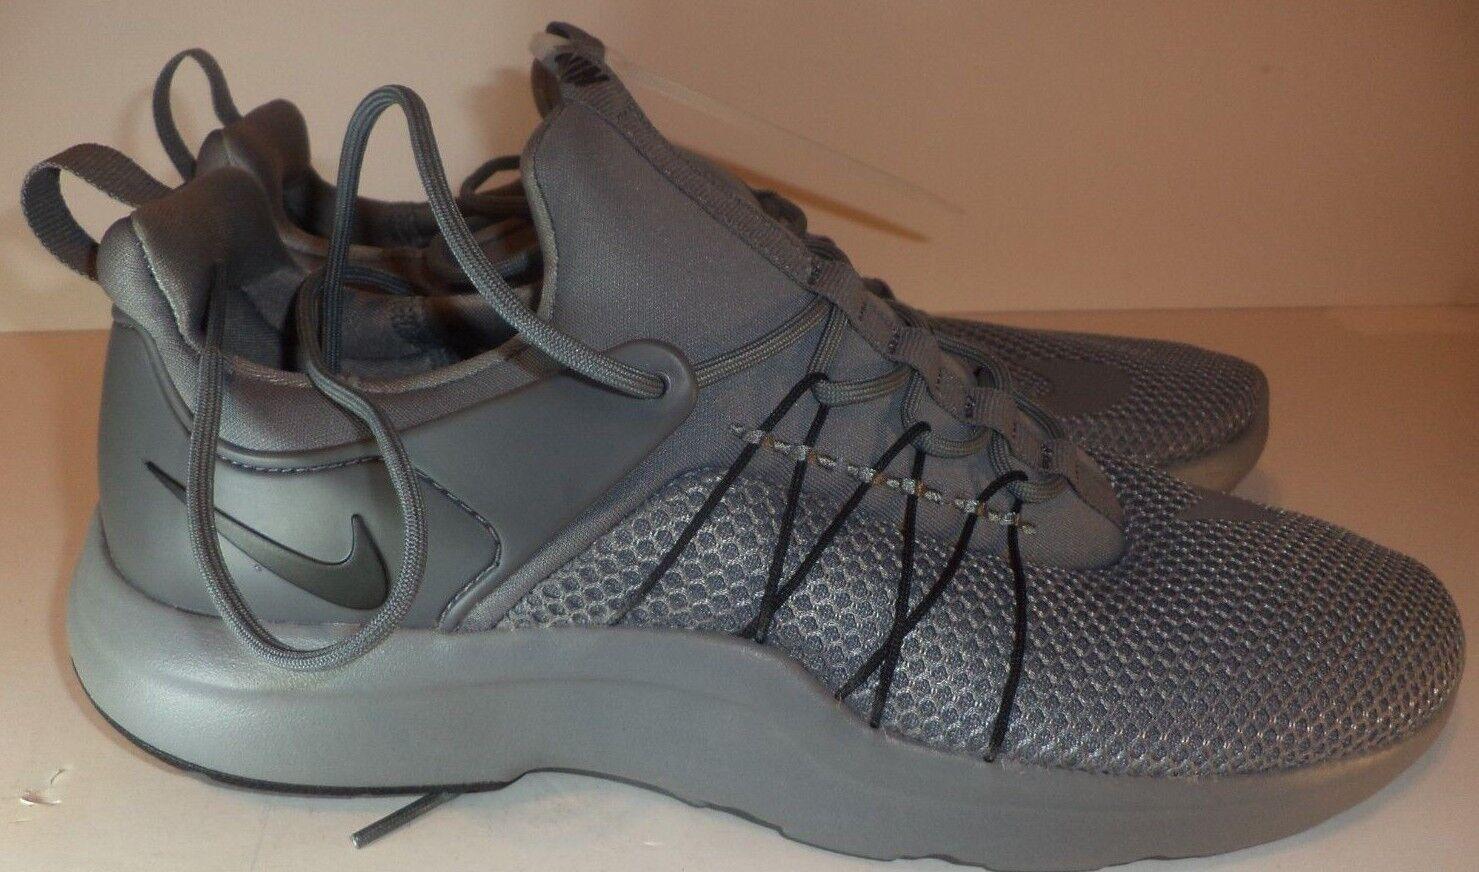 NIKE Men's Darwin Casual shoes Lightweight Comfort Athletic Sneaker Size 12